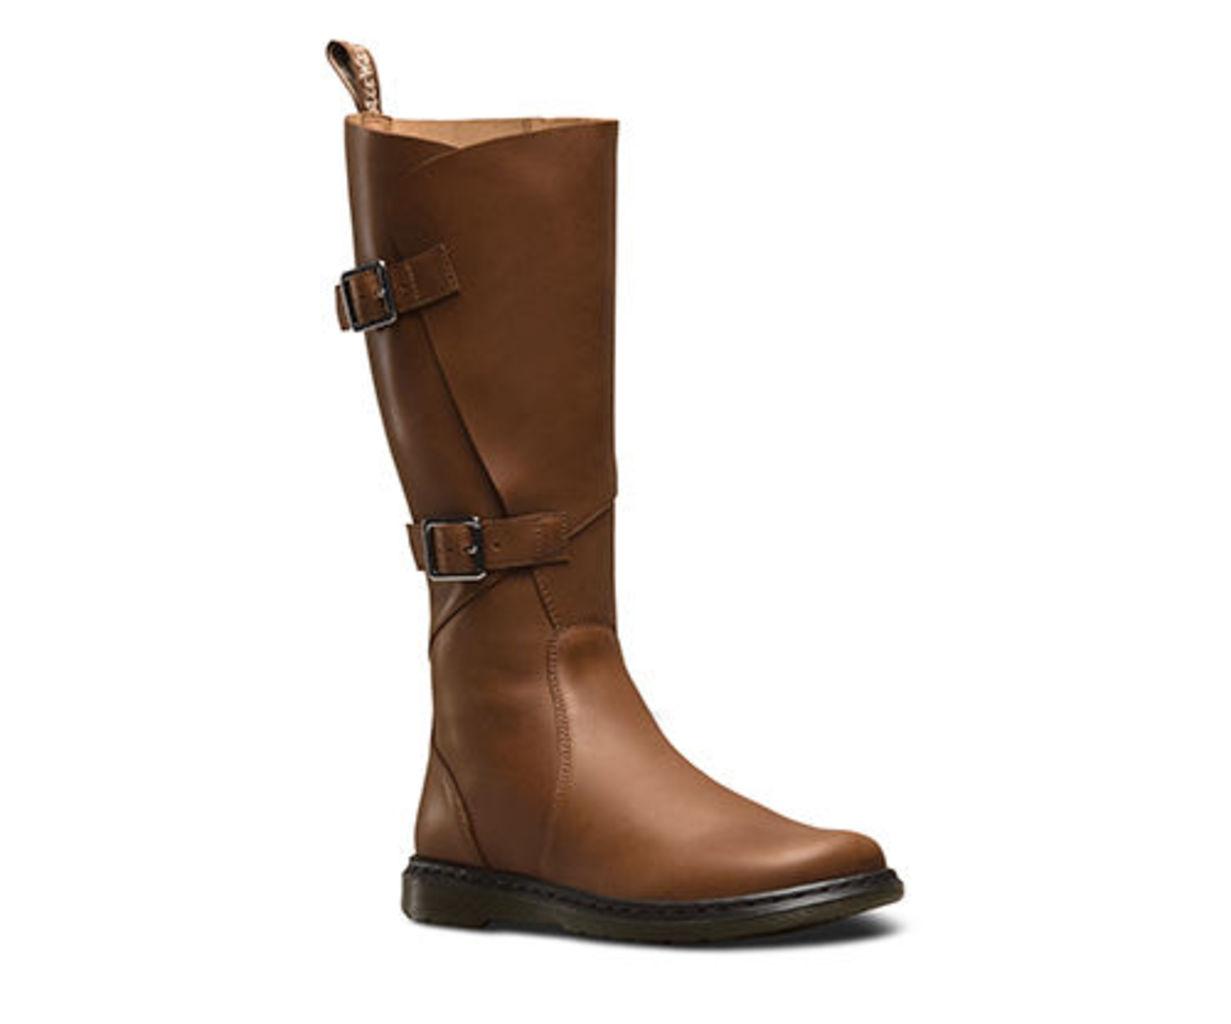 Caite Boot